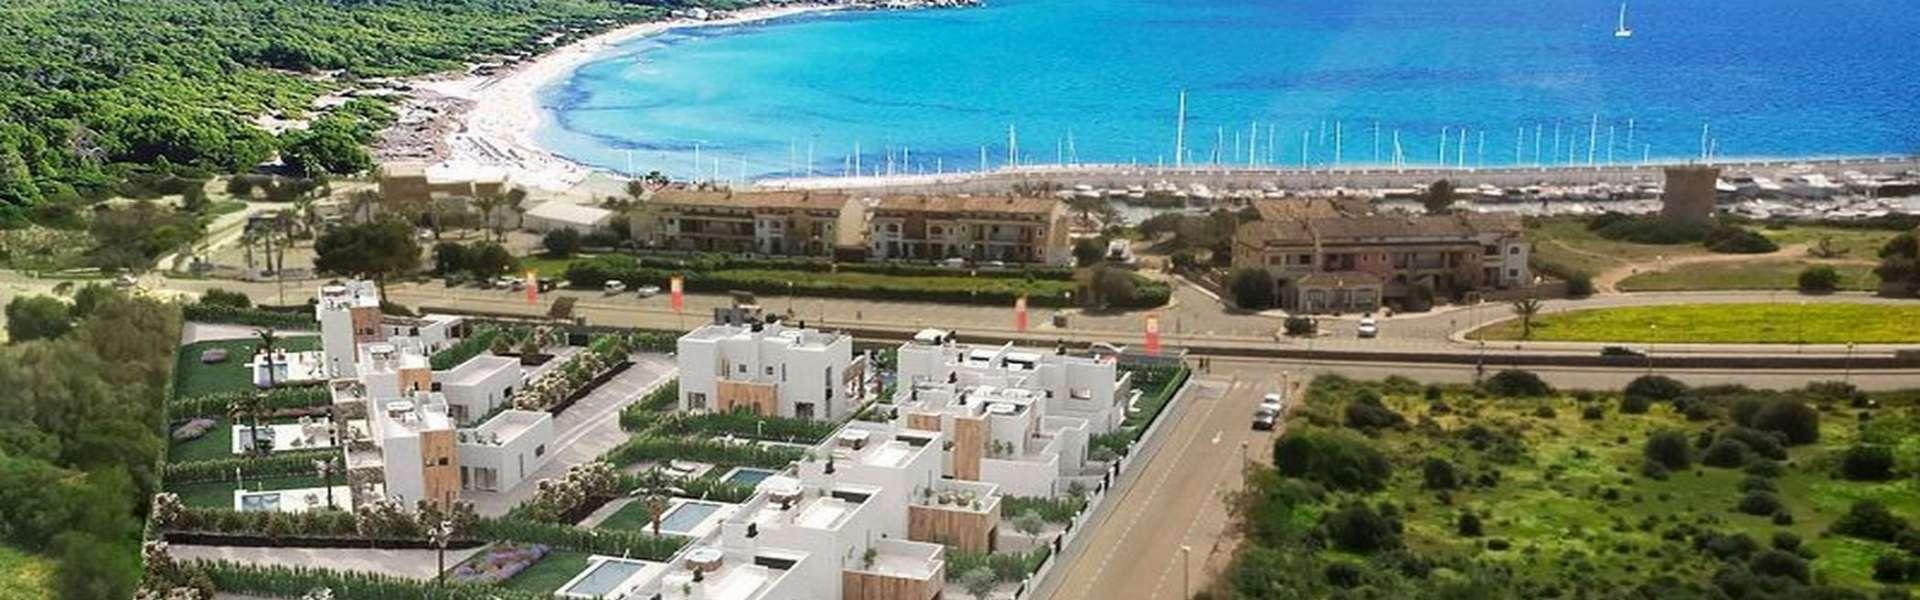 Sa Rapita - Luxus Villa in unmittelbarer Strand- und Hafennähe